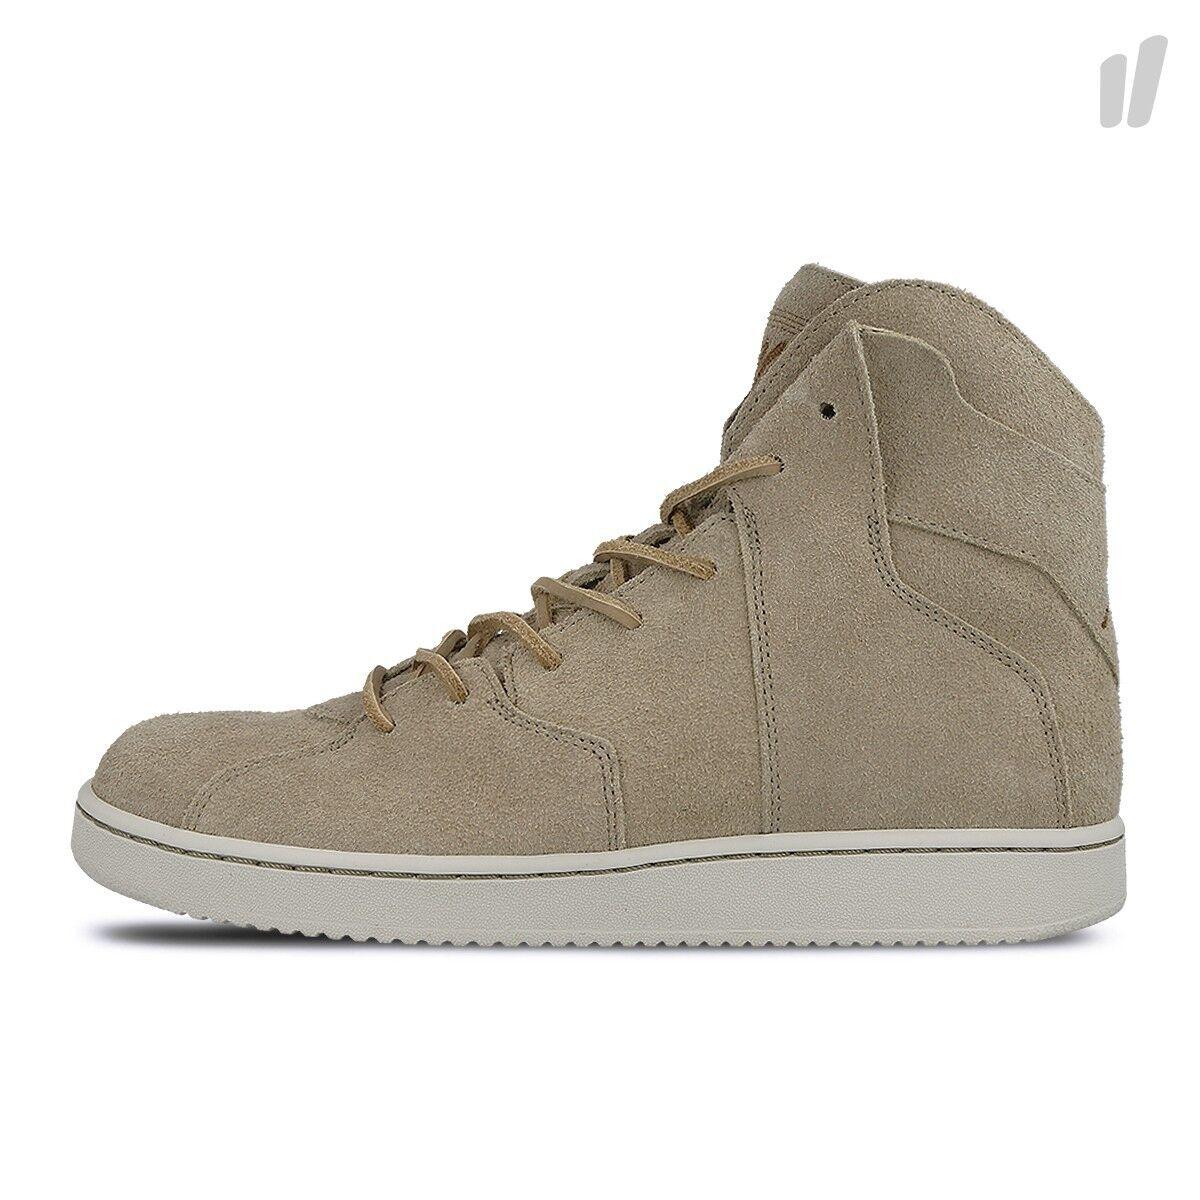 Nike Jordan Westbrook 0.2 Daim Baskets Bottes Fashion Hi Top UK 7 (EU 41) kaki